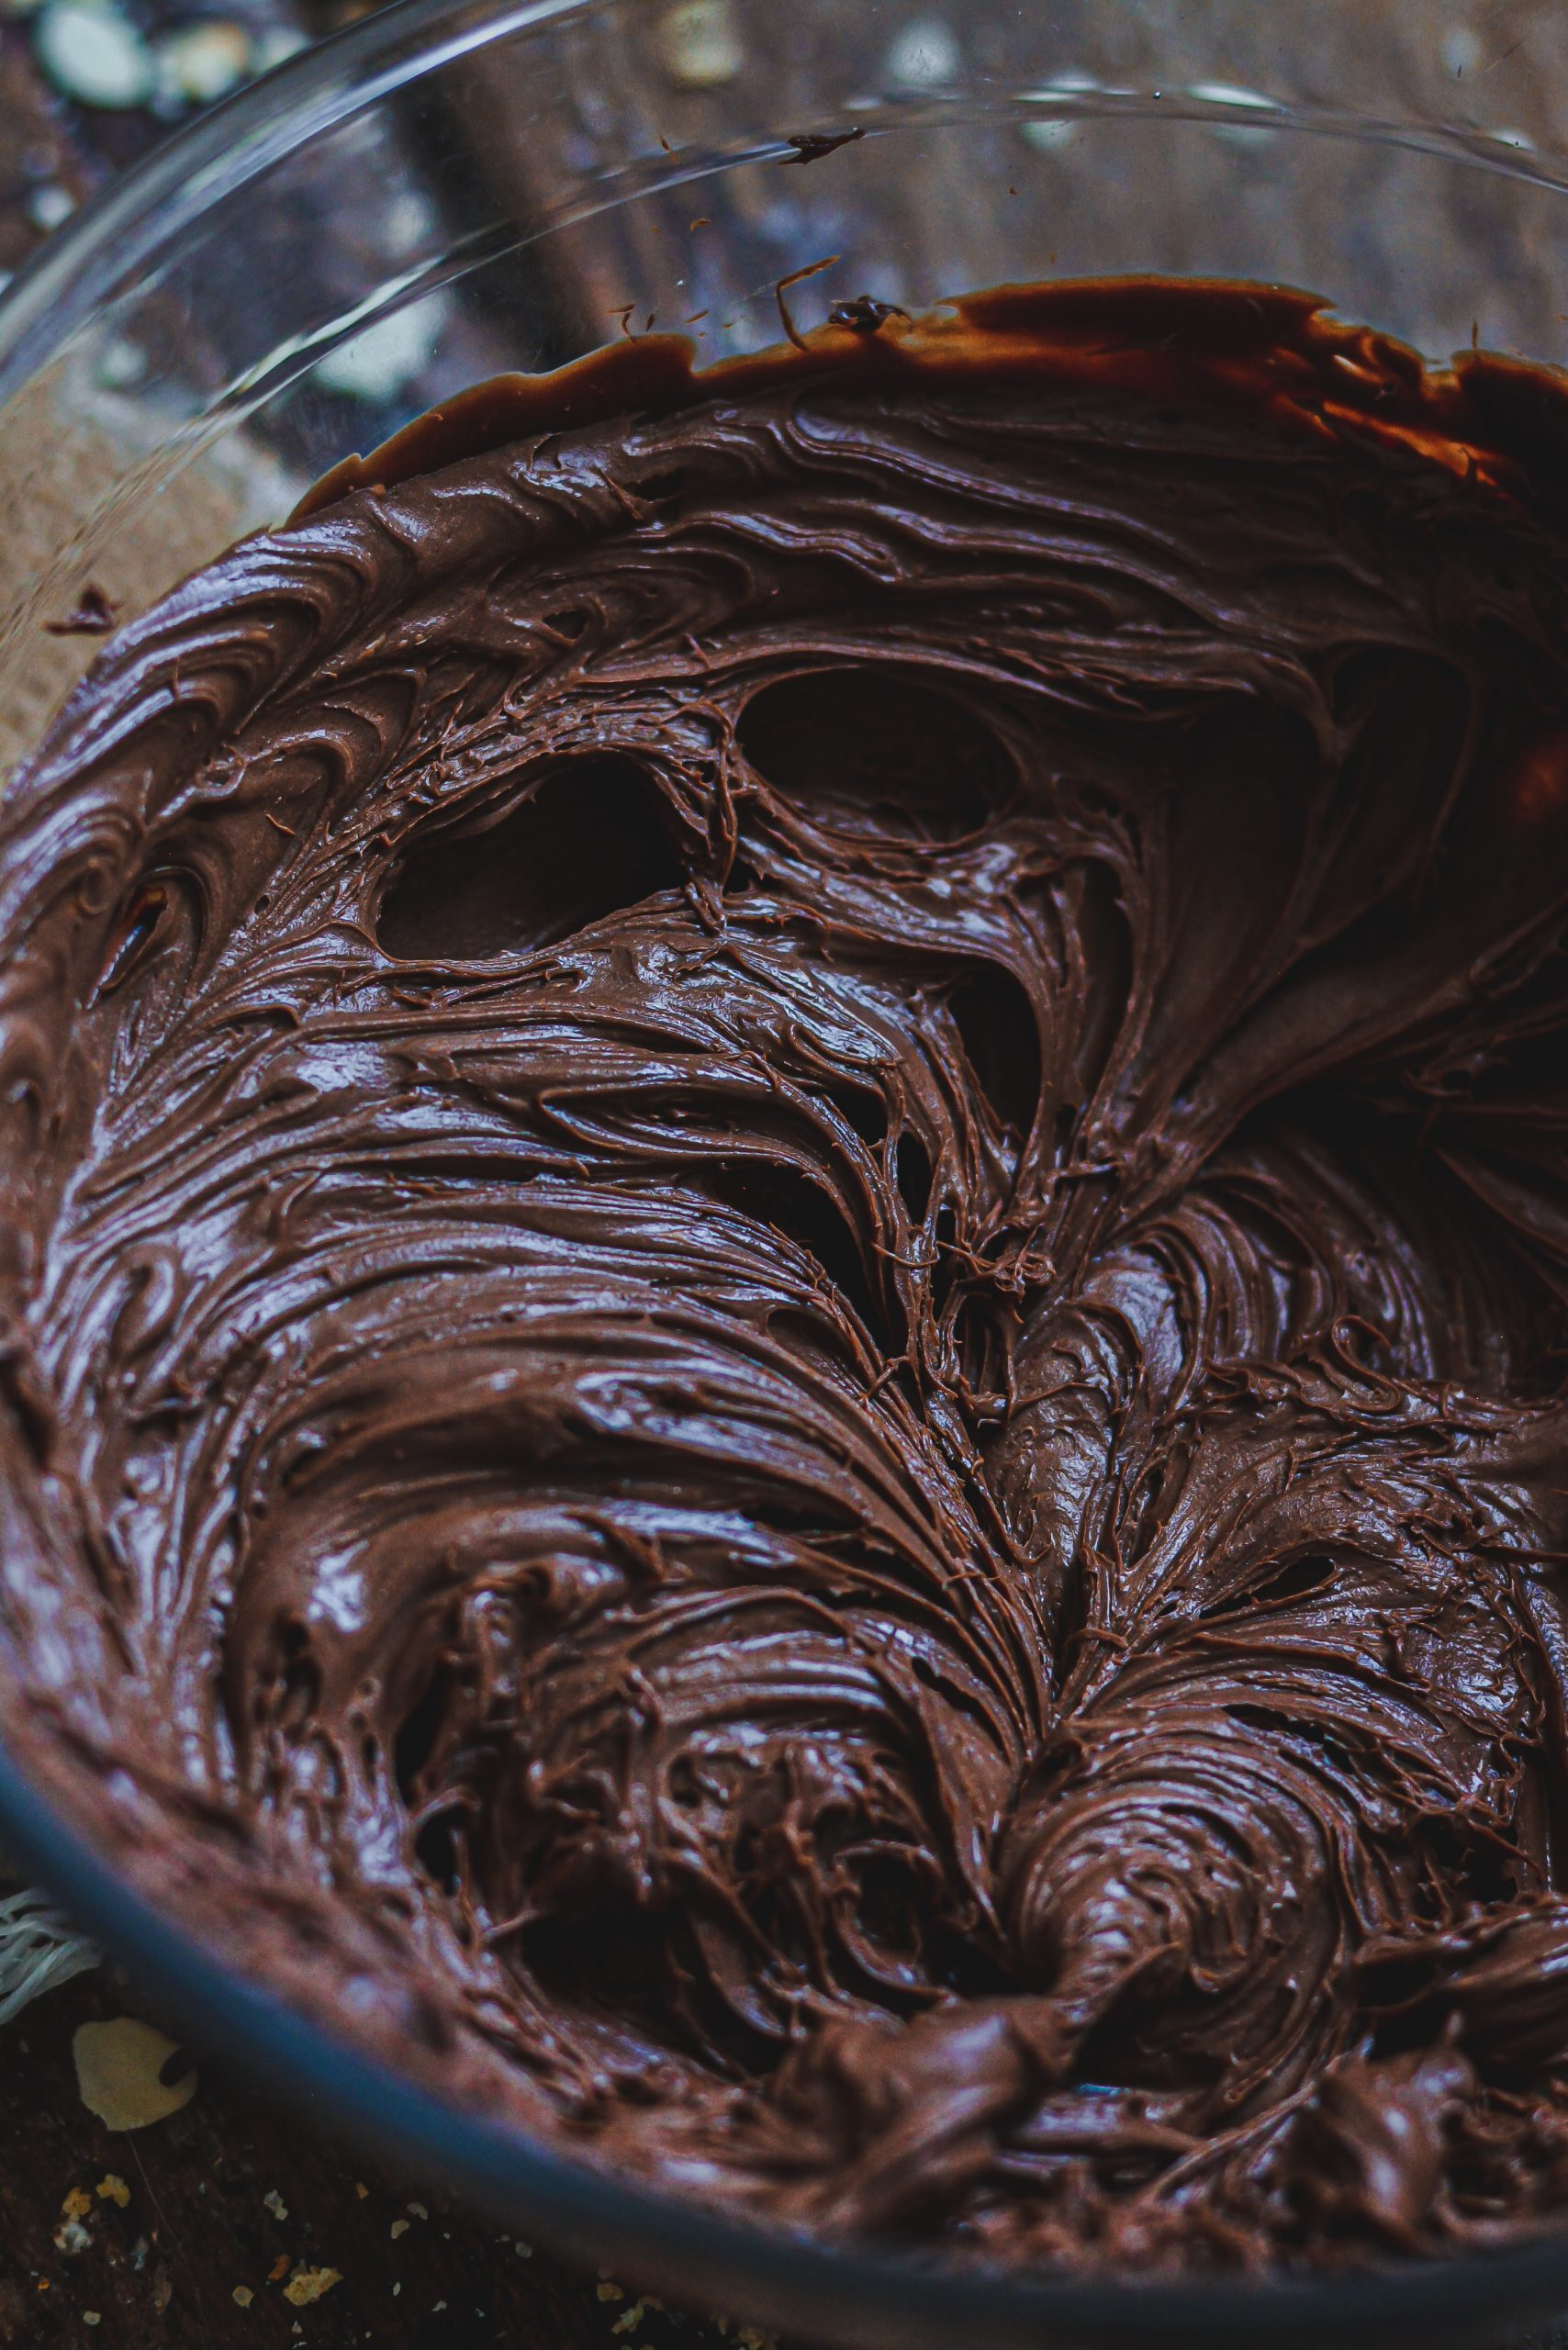 Comment Faire une Ganache au Chocolat Vegan / How to Make : Vegan Chocolate Frosting